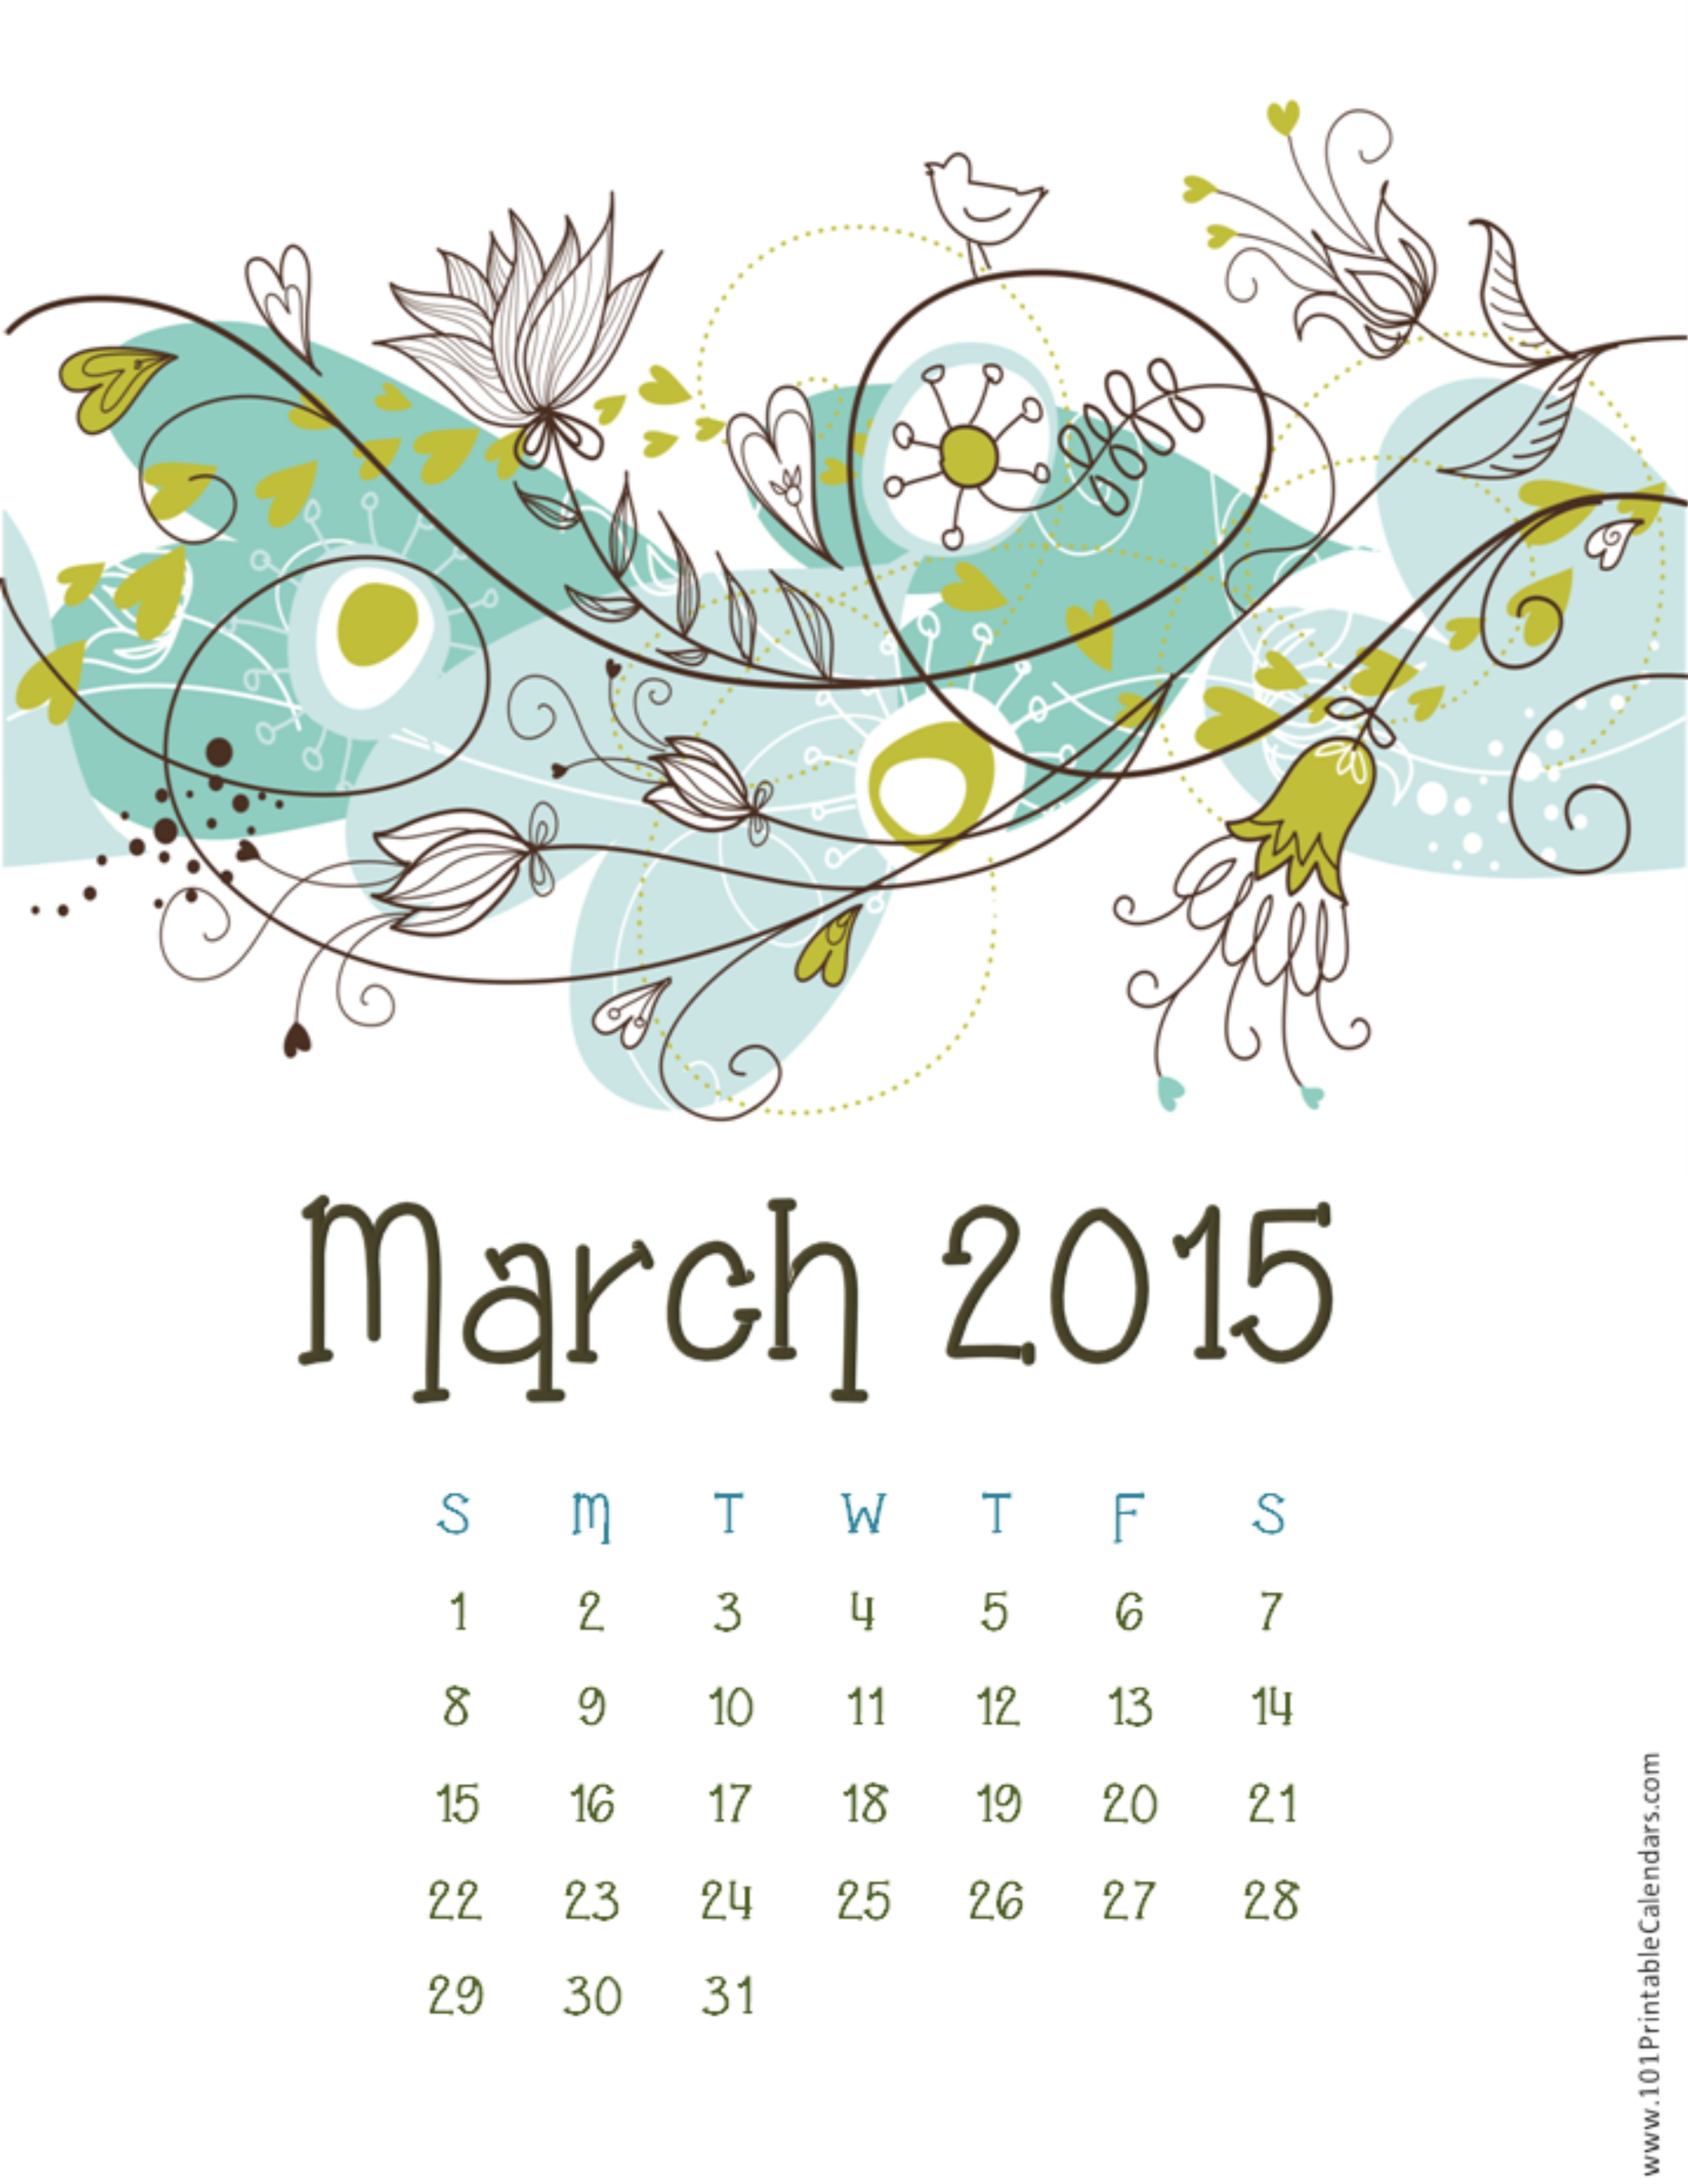 Beautiful March 2015 Calendar Images Pics and Wallpaper HD Happy 2550x3300